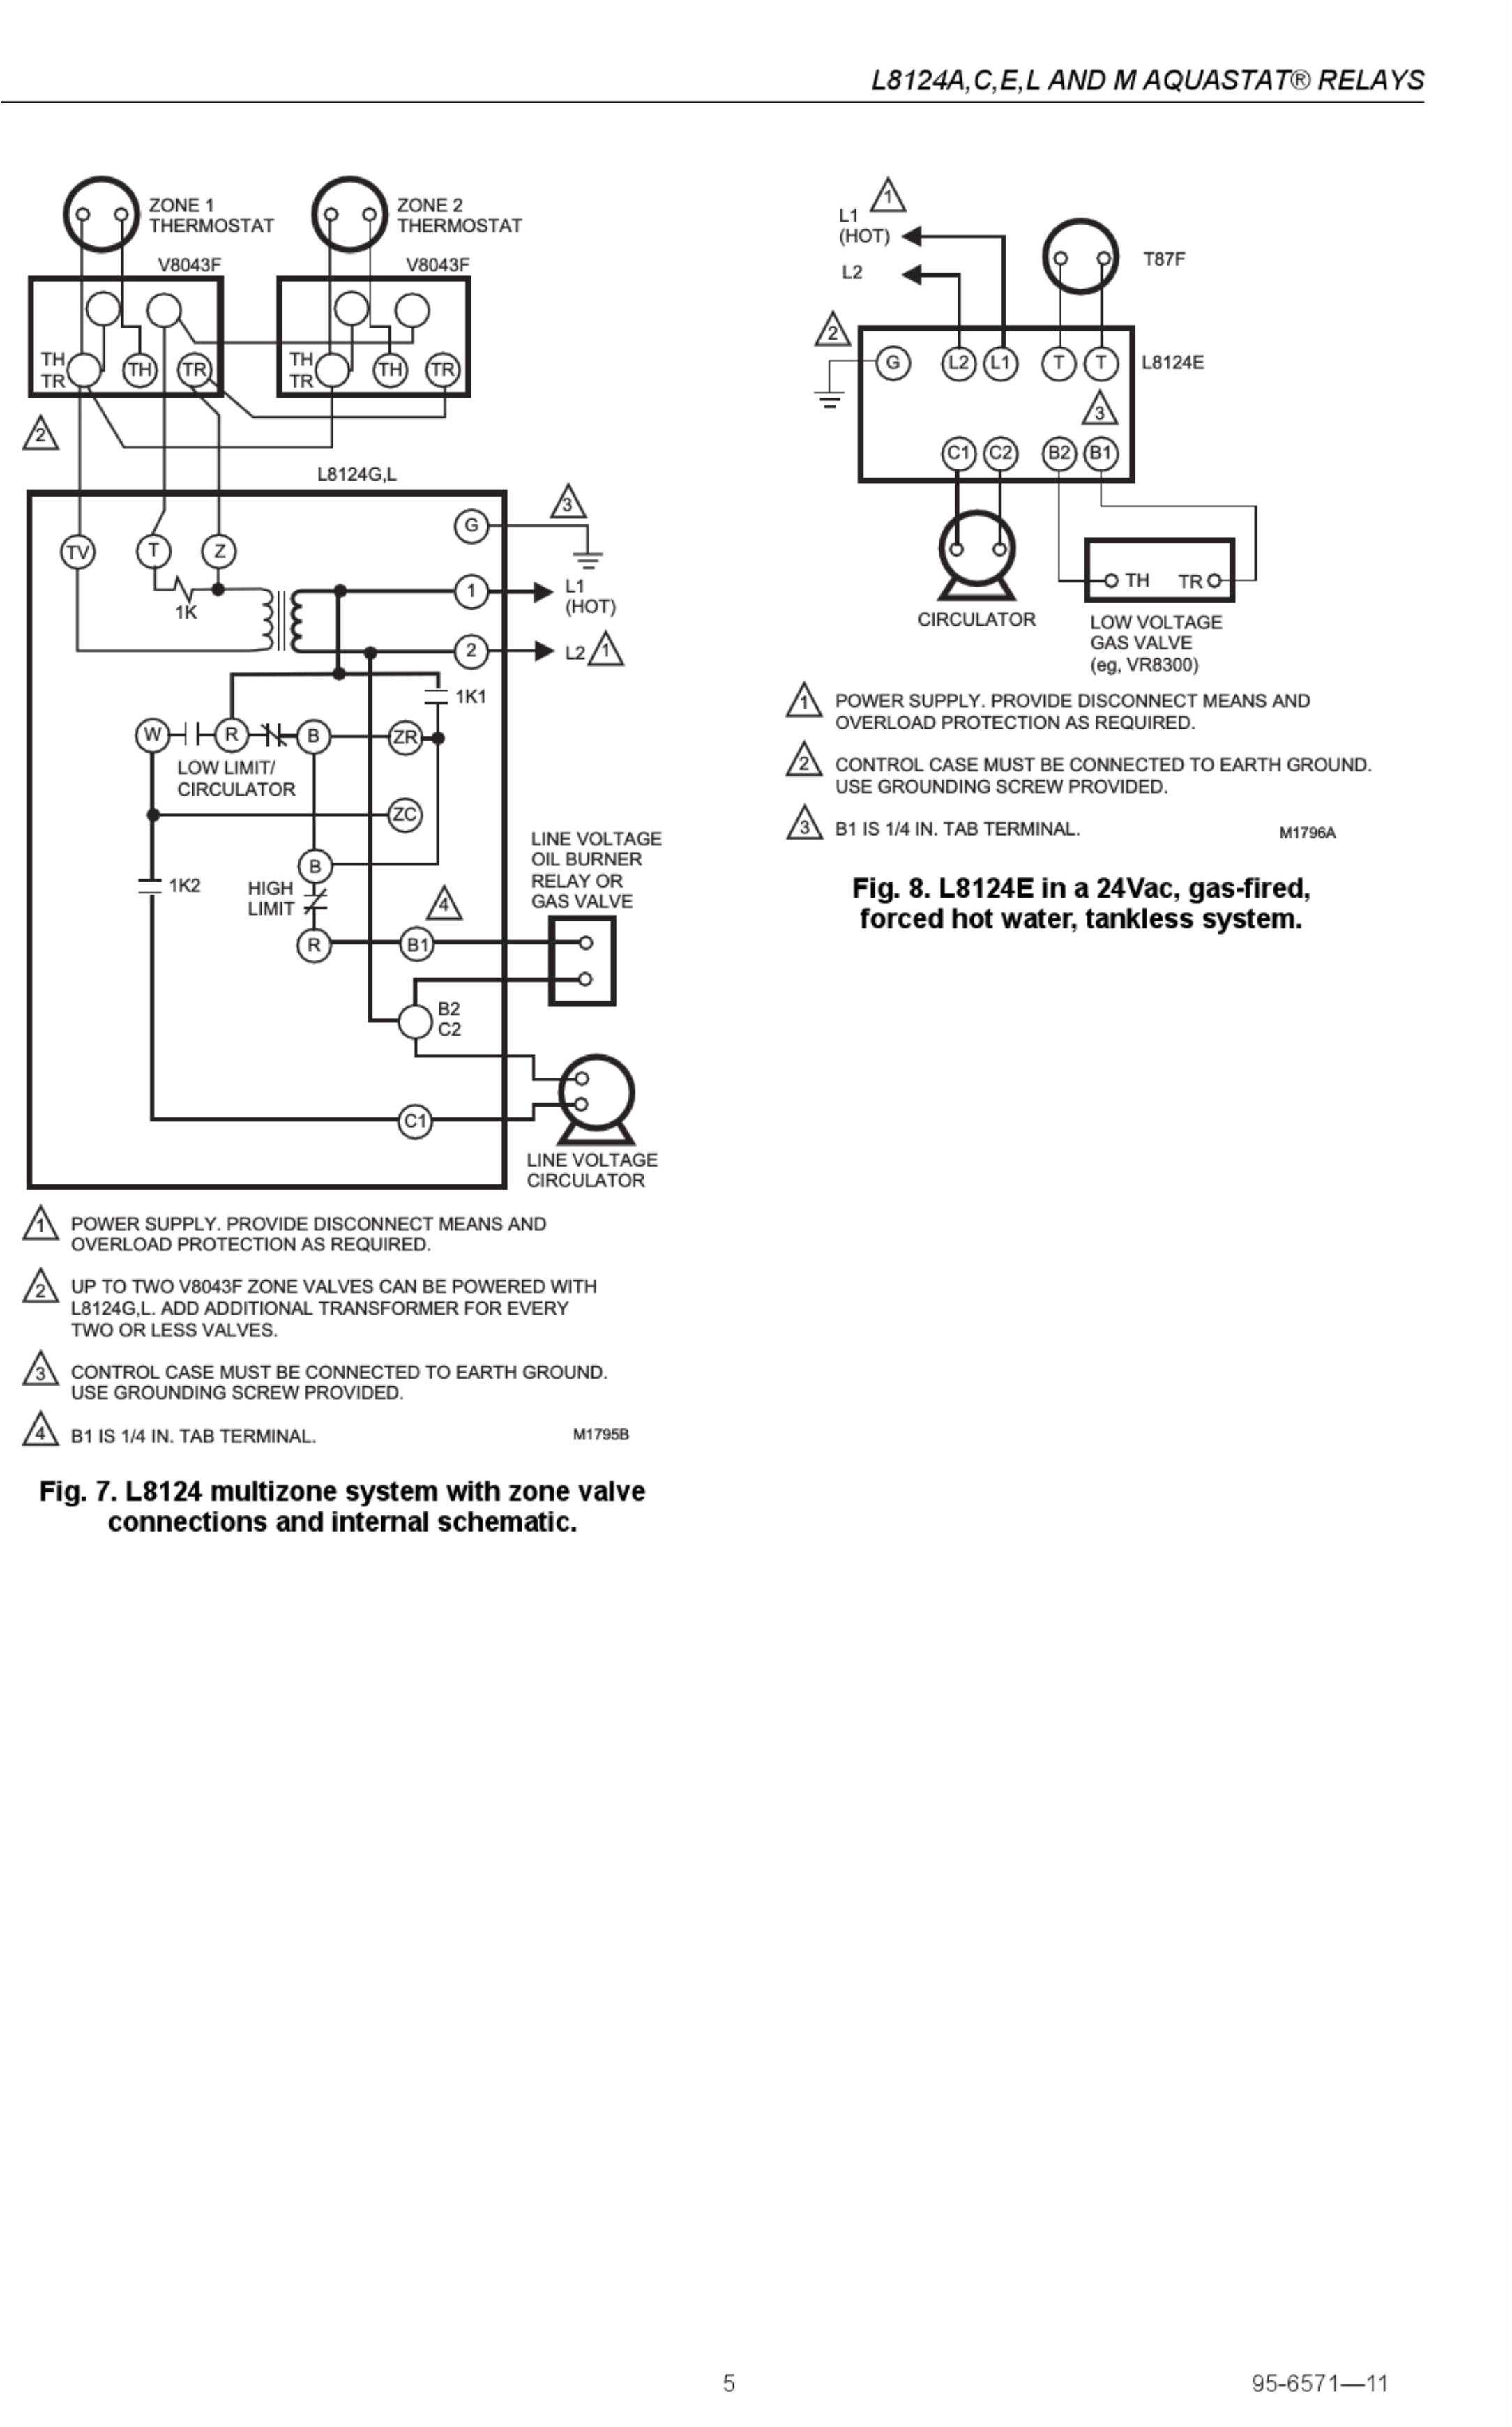 Honeywell Ra832a Wiring Diagram Honeywell Ml6984a4000 Wiring Diagram Wiring Diagrams Lol